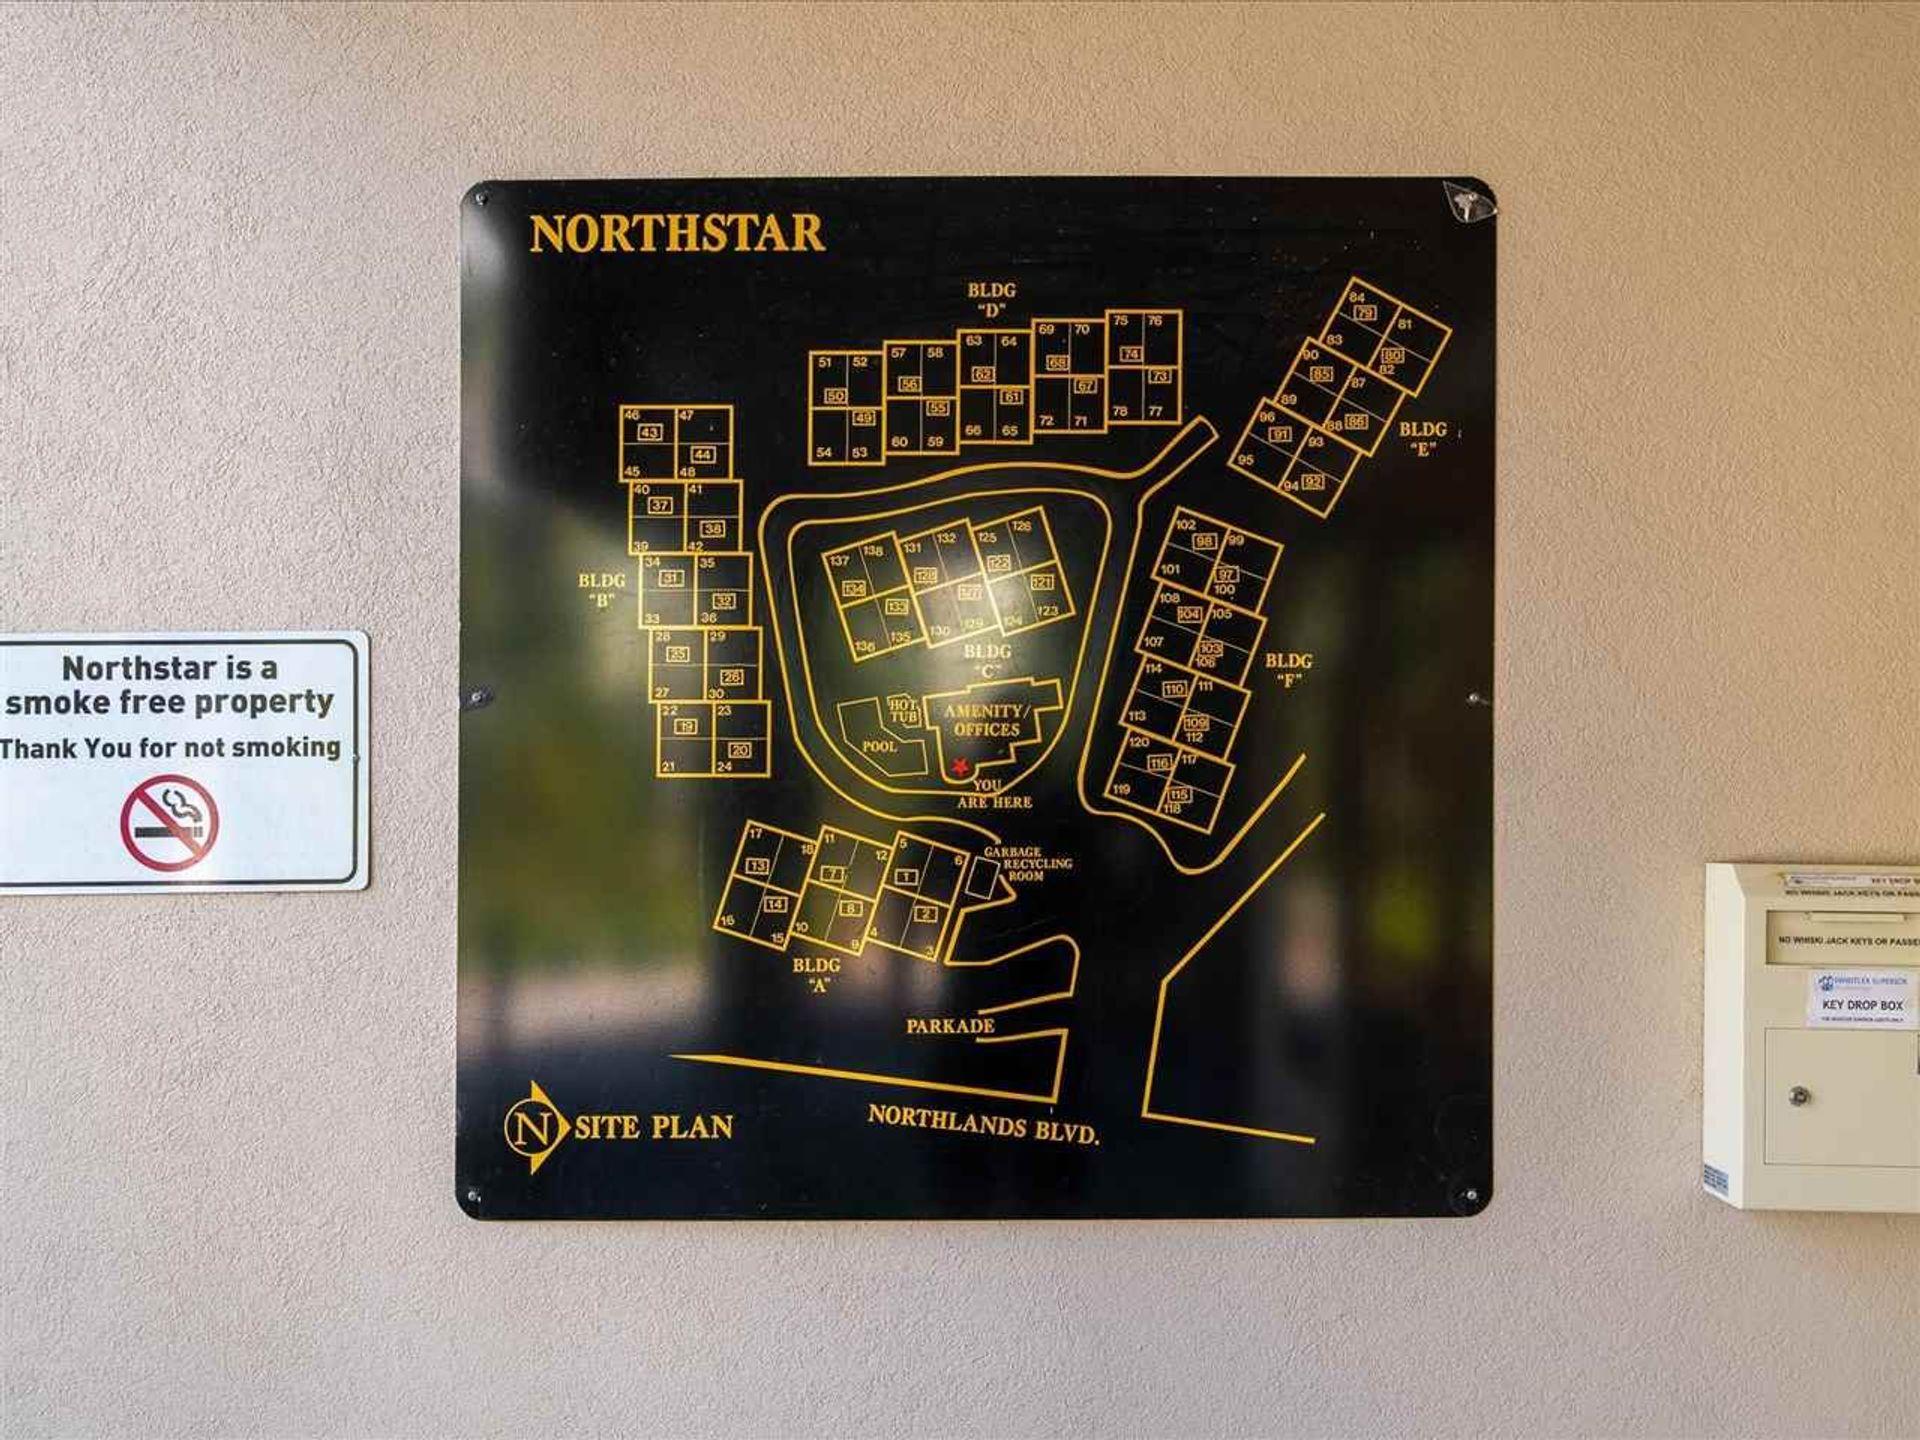 4355-northlands-boulevard-whistler-village-whistler-19 at 98 - 4355 Northlands Boulevard, Whistler Village, Whistler